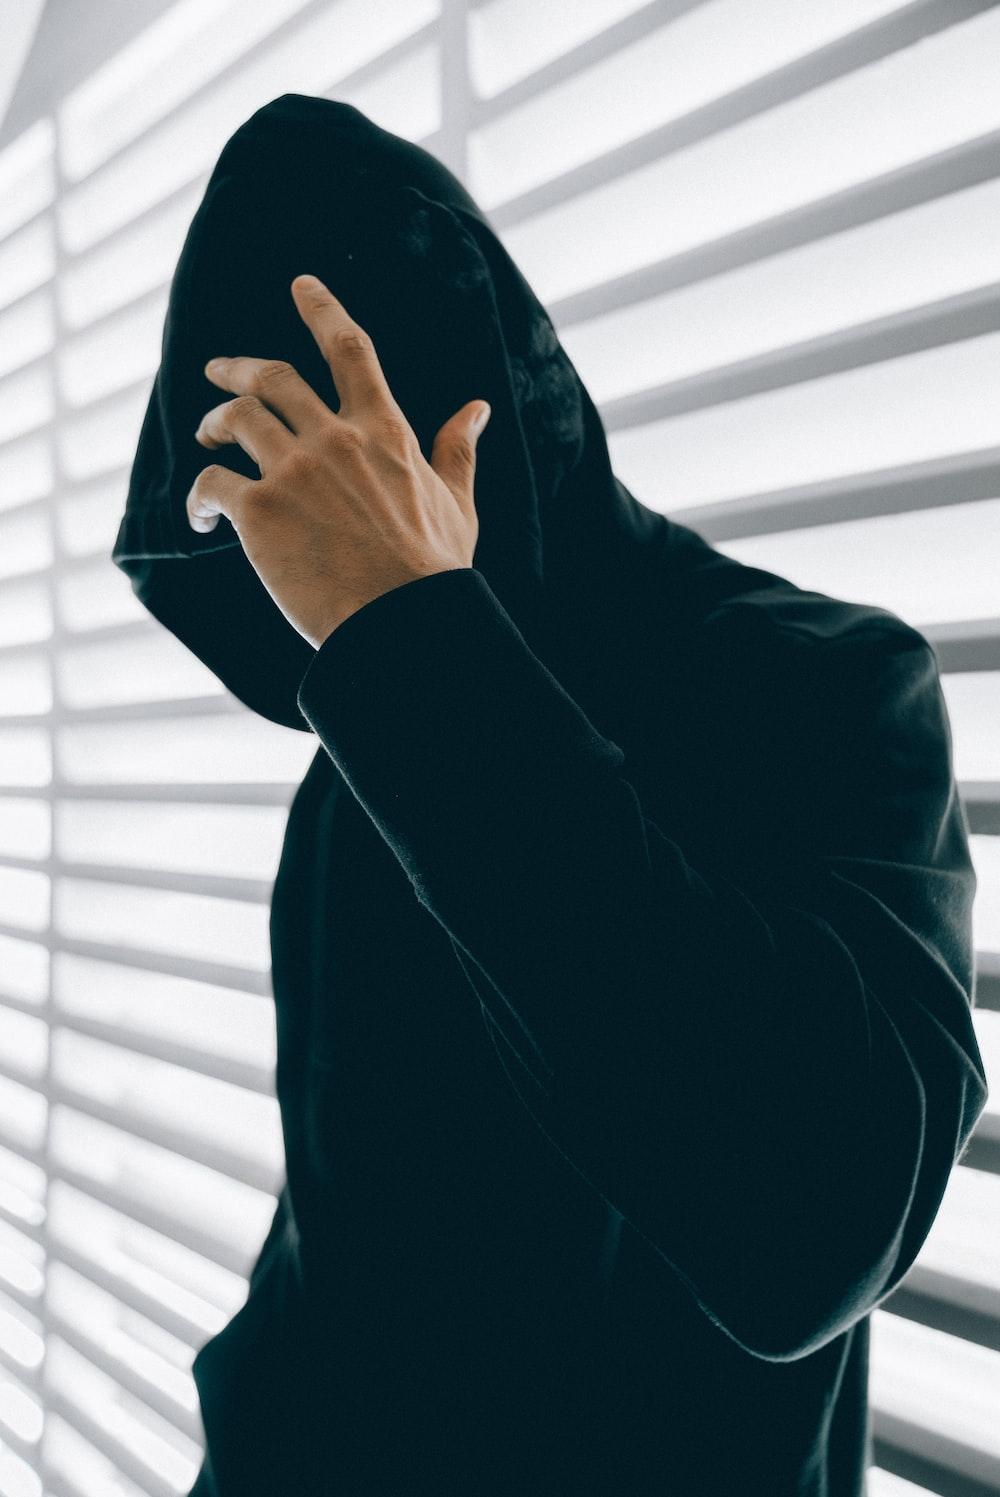 person wearing green hooded jacket inside room